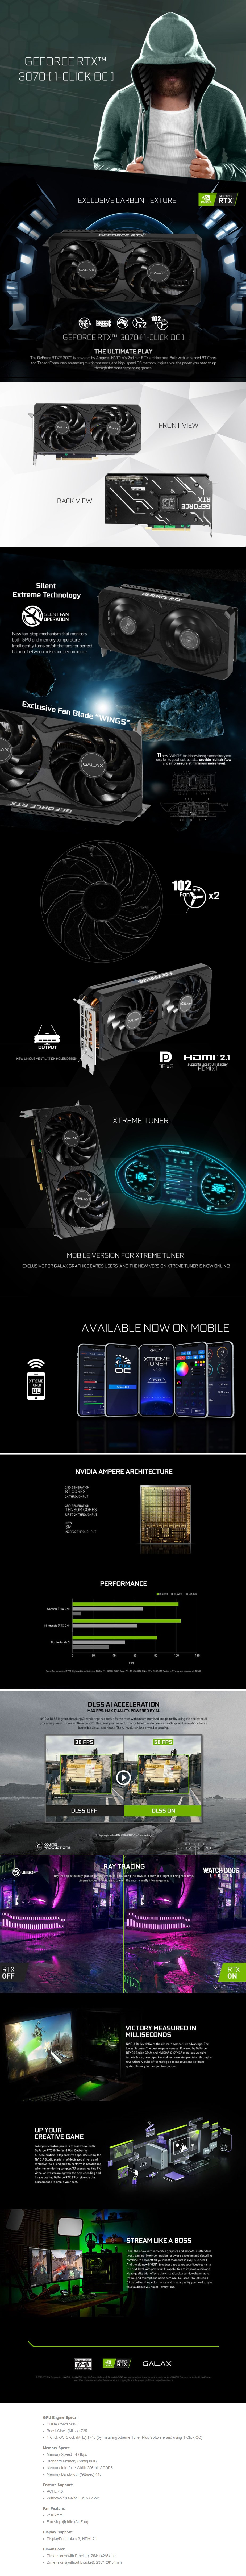 GALAX GeForce RTX 3070 1-Click OC 8GB Video Card - Overview 1